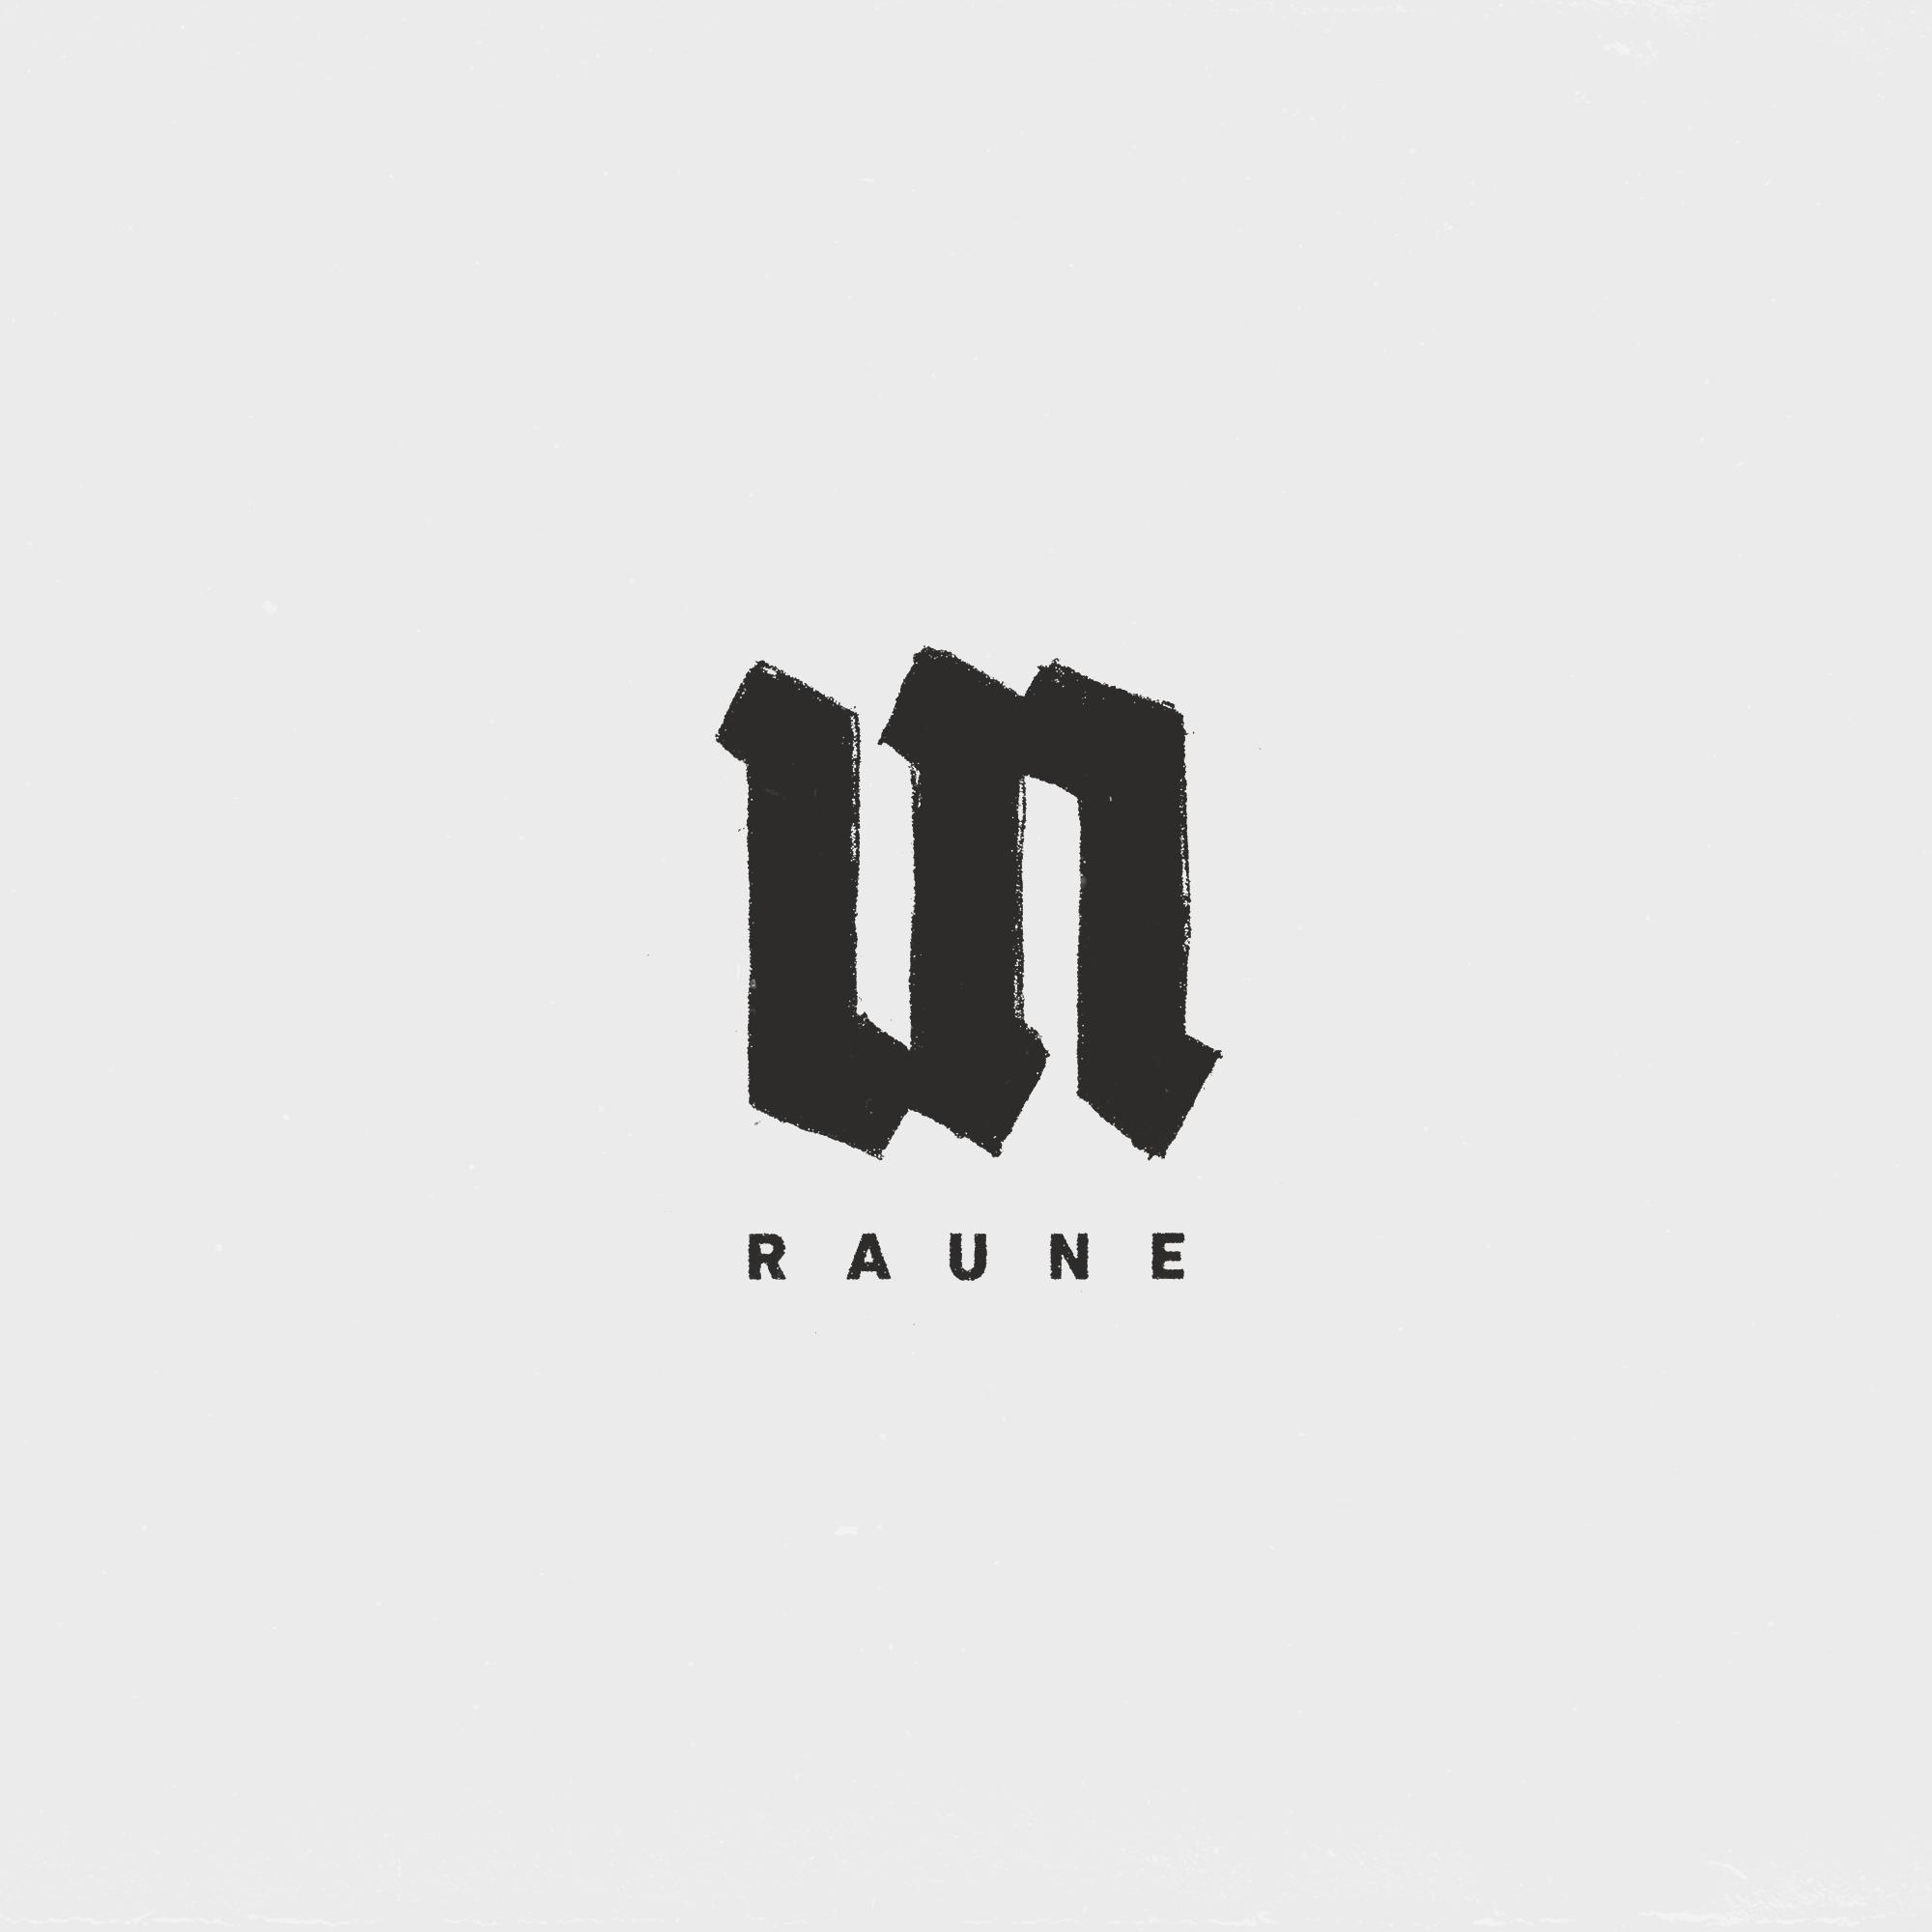 Superkolor_Work_Music_And_Print_Raune